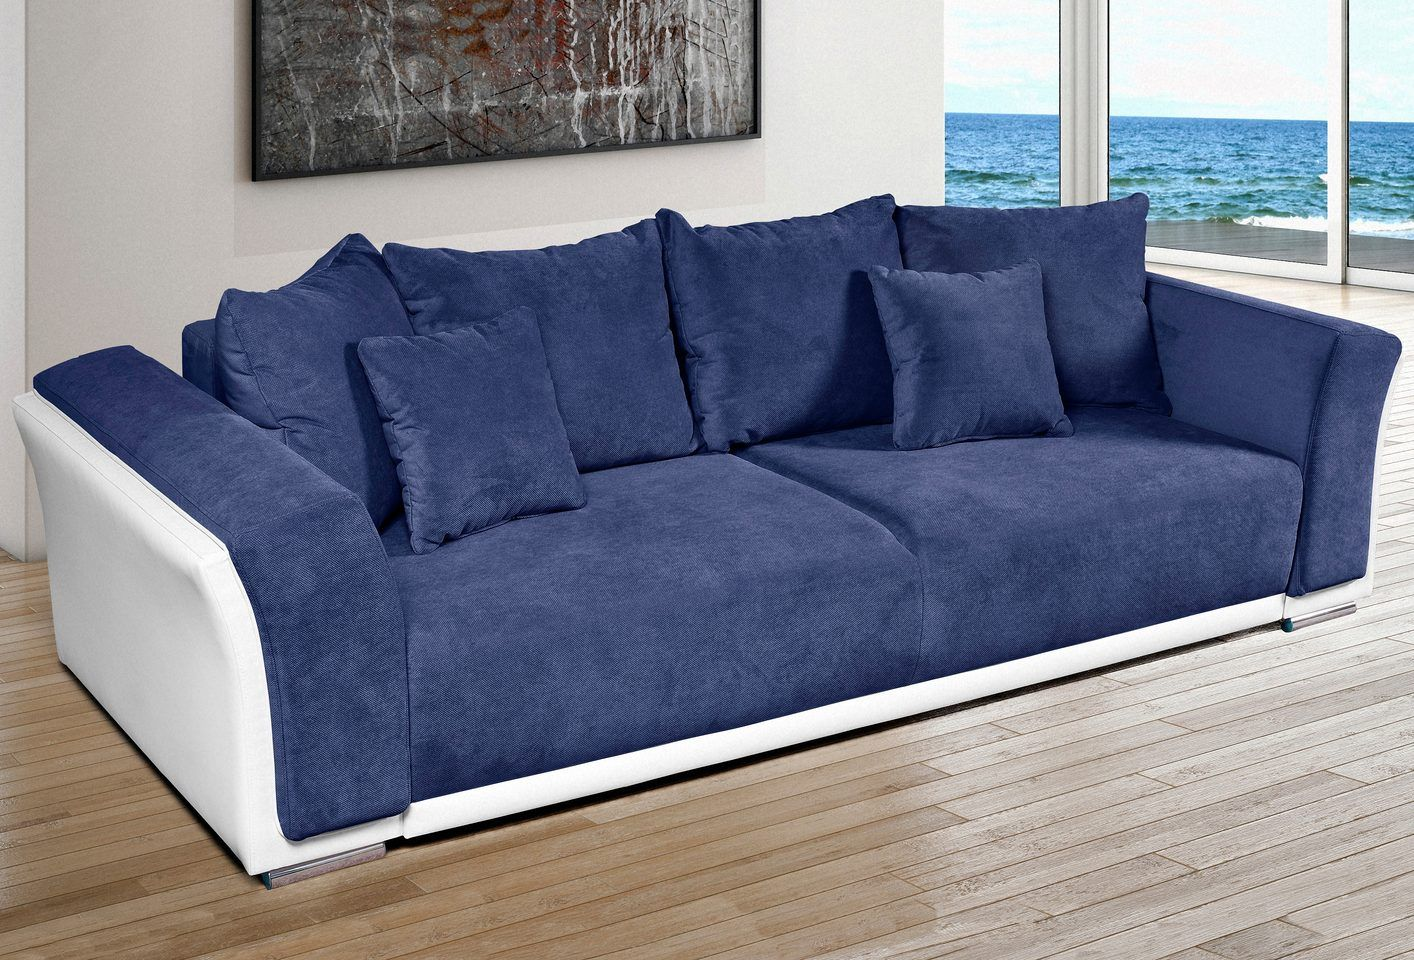 Inosign Schlafsofa Couch Sofa Home Decor